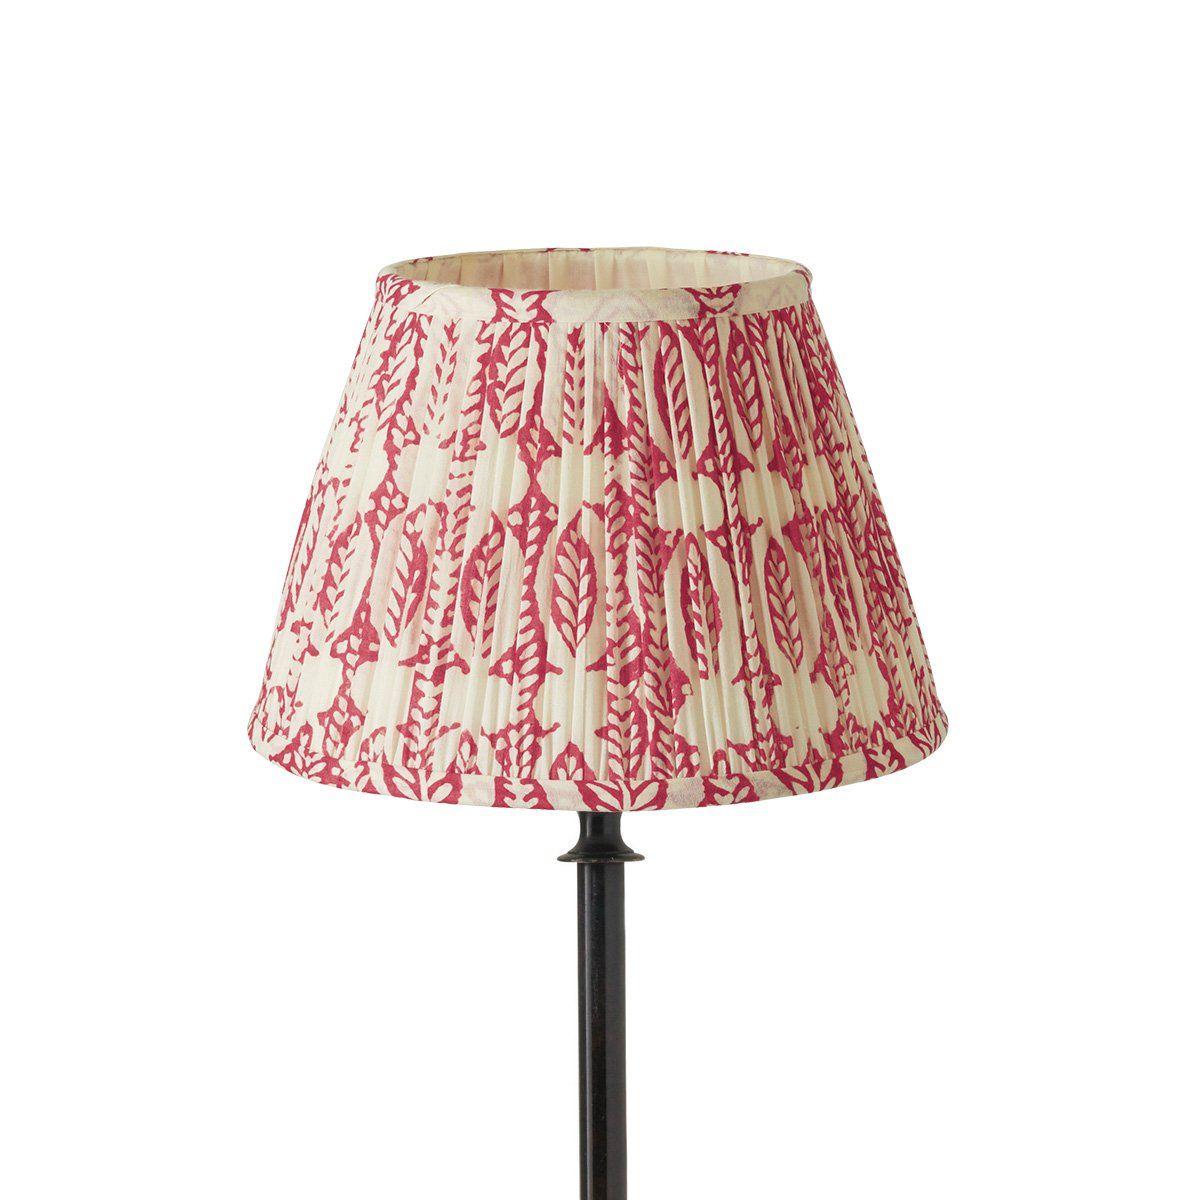 25cm Pleated Daun Cotton Lampshade Lamp Shades Old